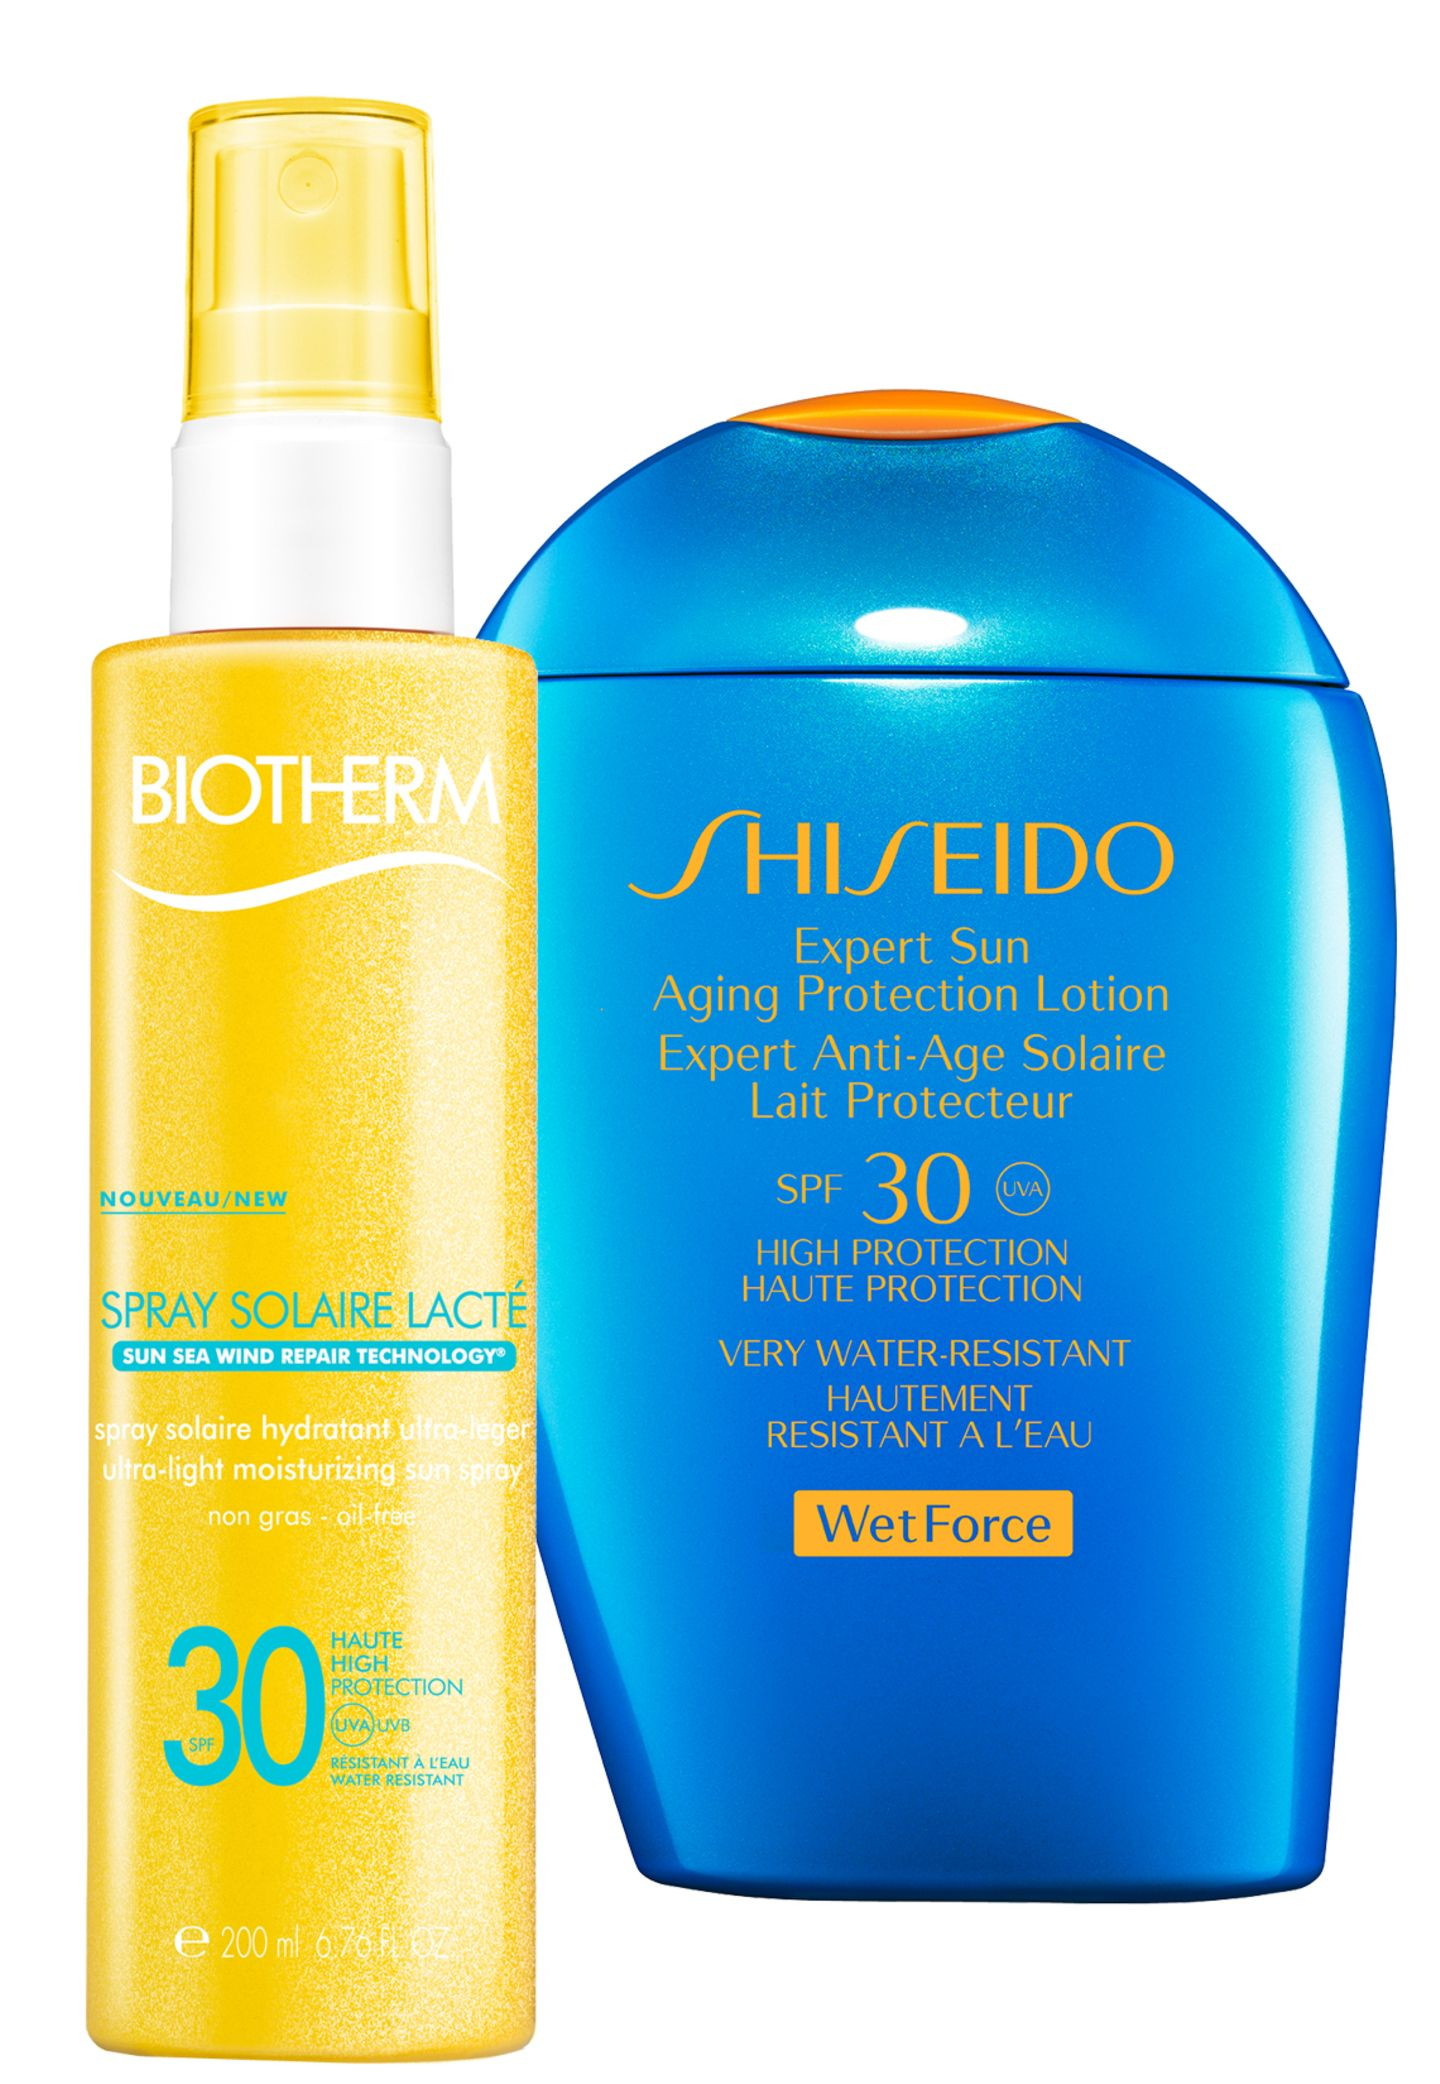 "Links:  ""Spray Solaire Lacté LSF 15"" von Biotherm, 200 ml, ca. 26 Euro; Rechts: ""Expert Sun Aging Protection Lotion SPF 30"" von Shiseido, 100 ml, ca. 31 Euro"